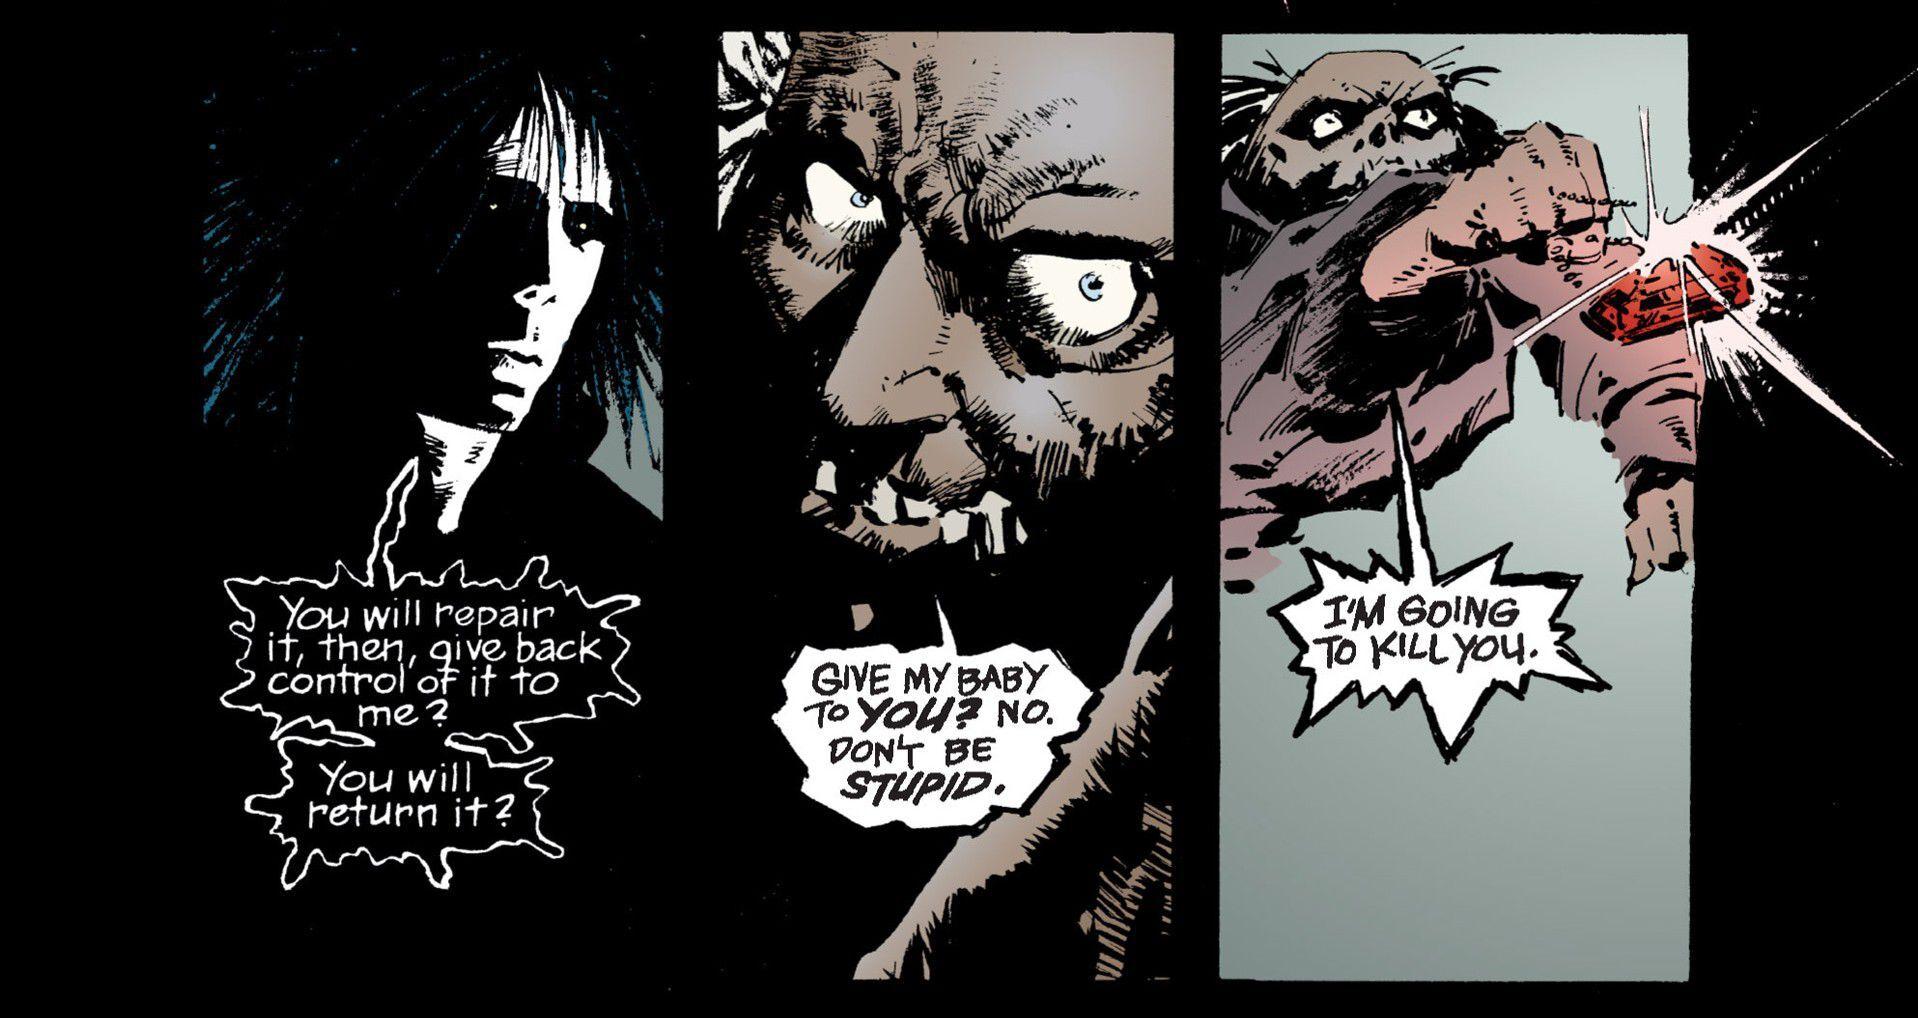 The Sandman Recensione - Nerdcore - Vignetta 2